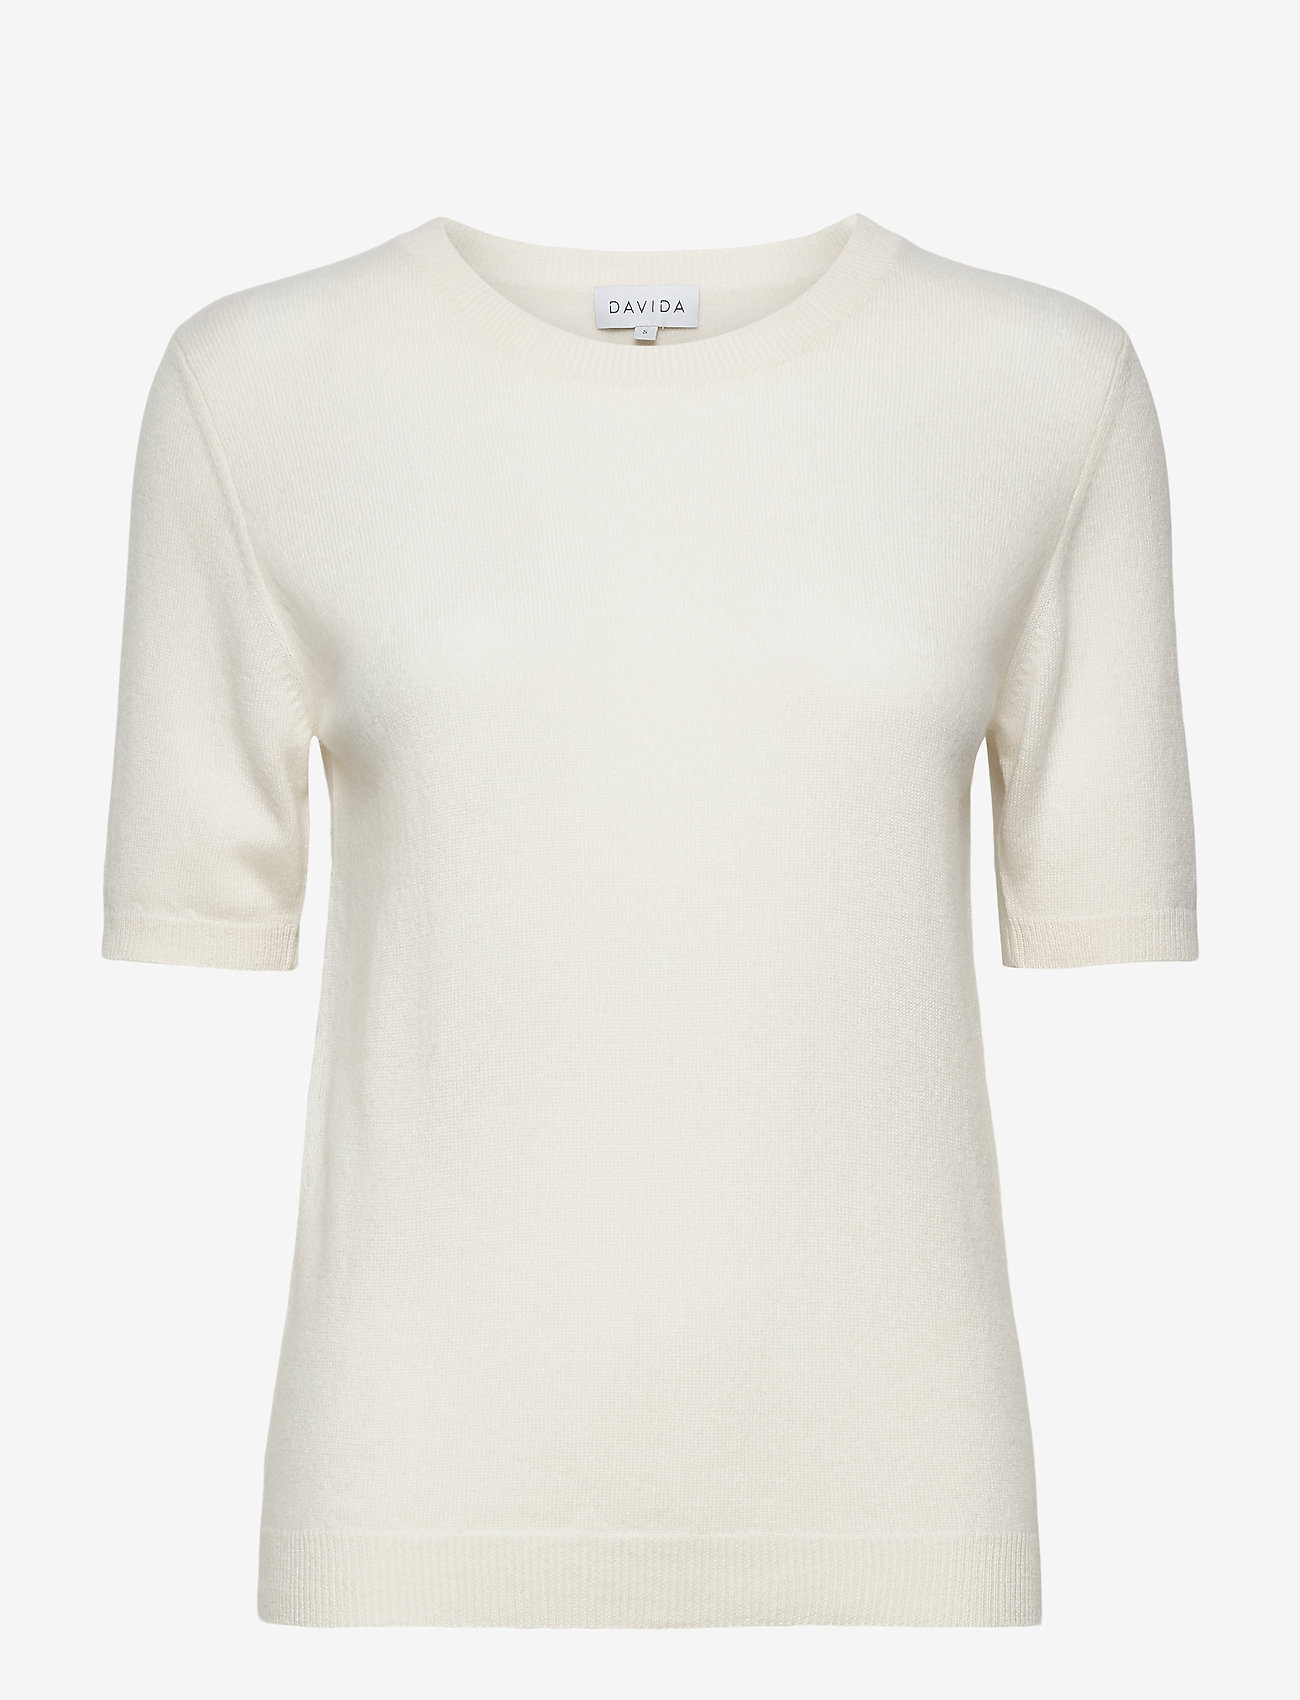 Davida Cashmere - T-shirt Oversized - knitted tops - white - 1